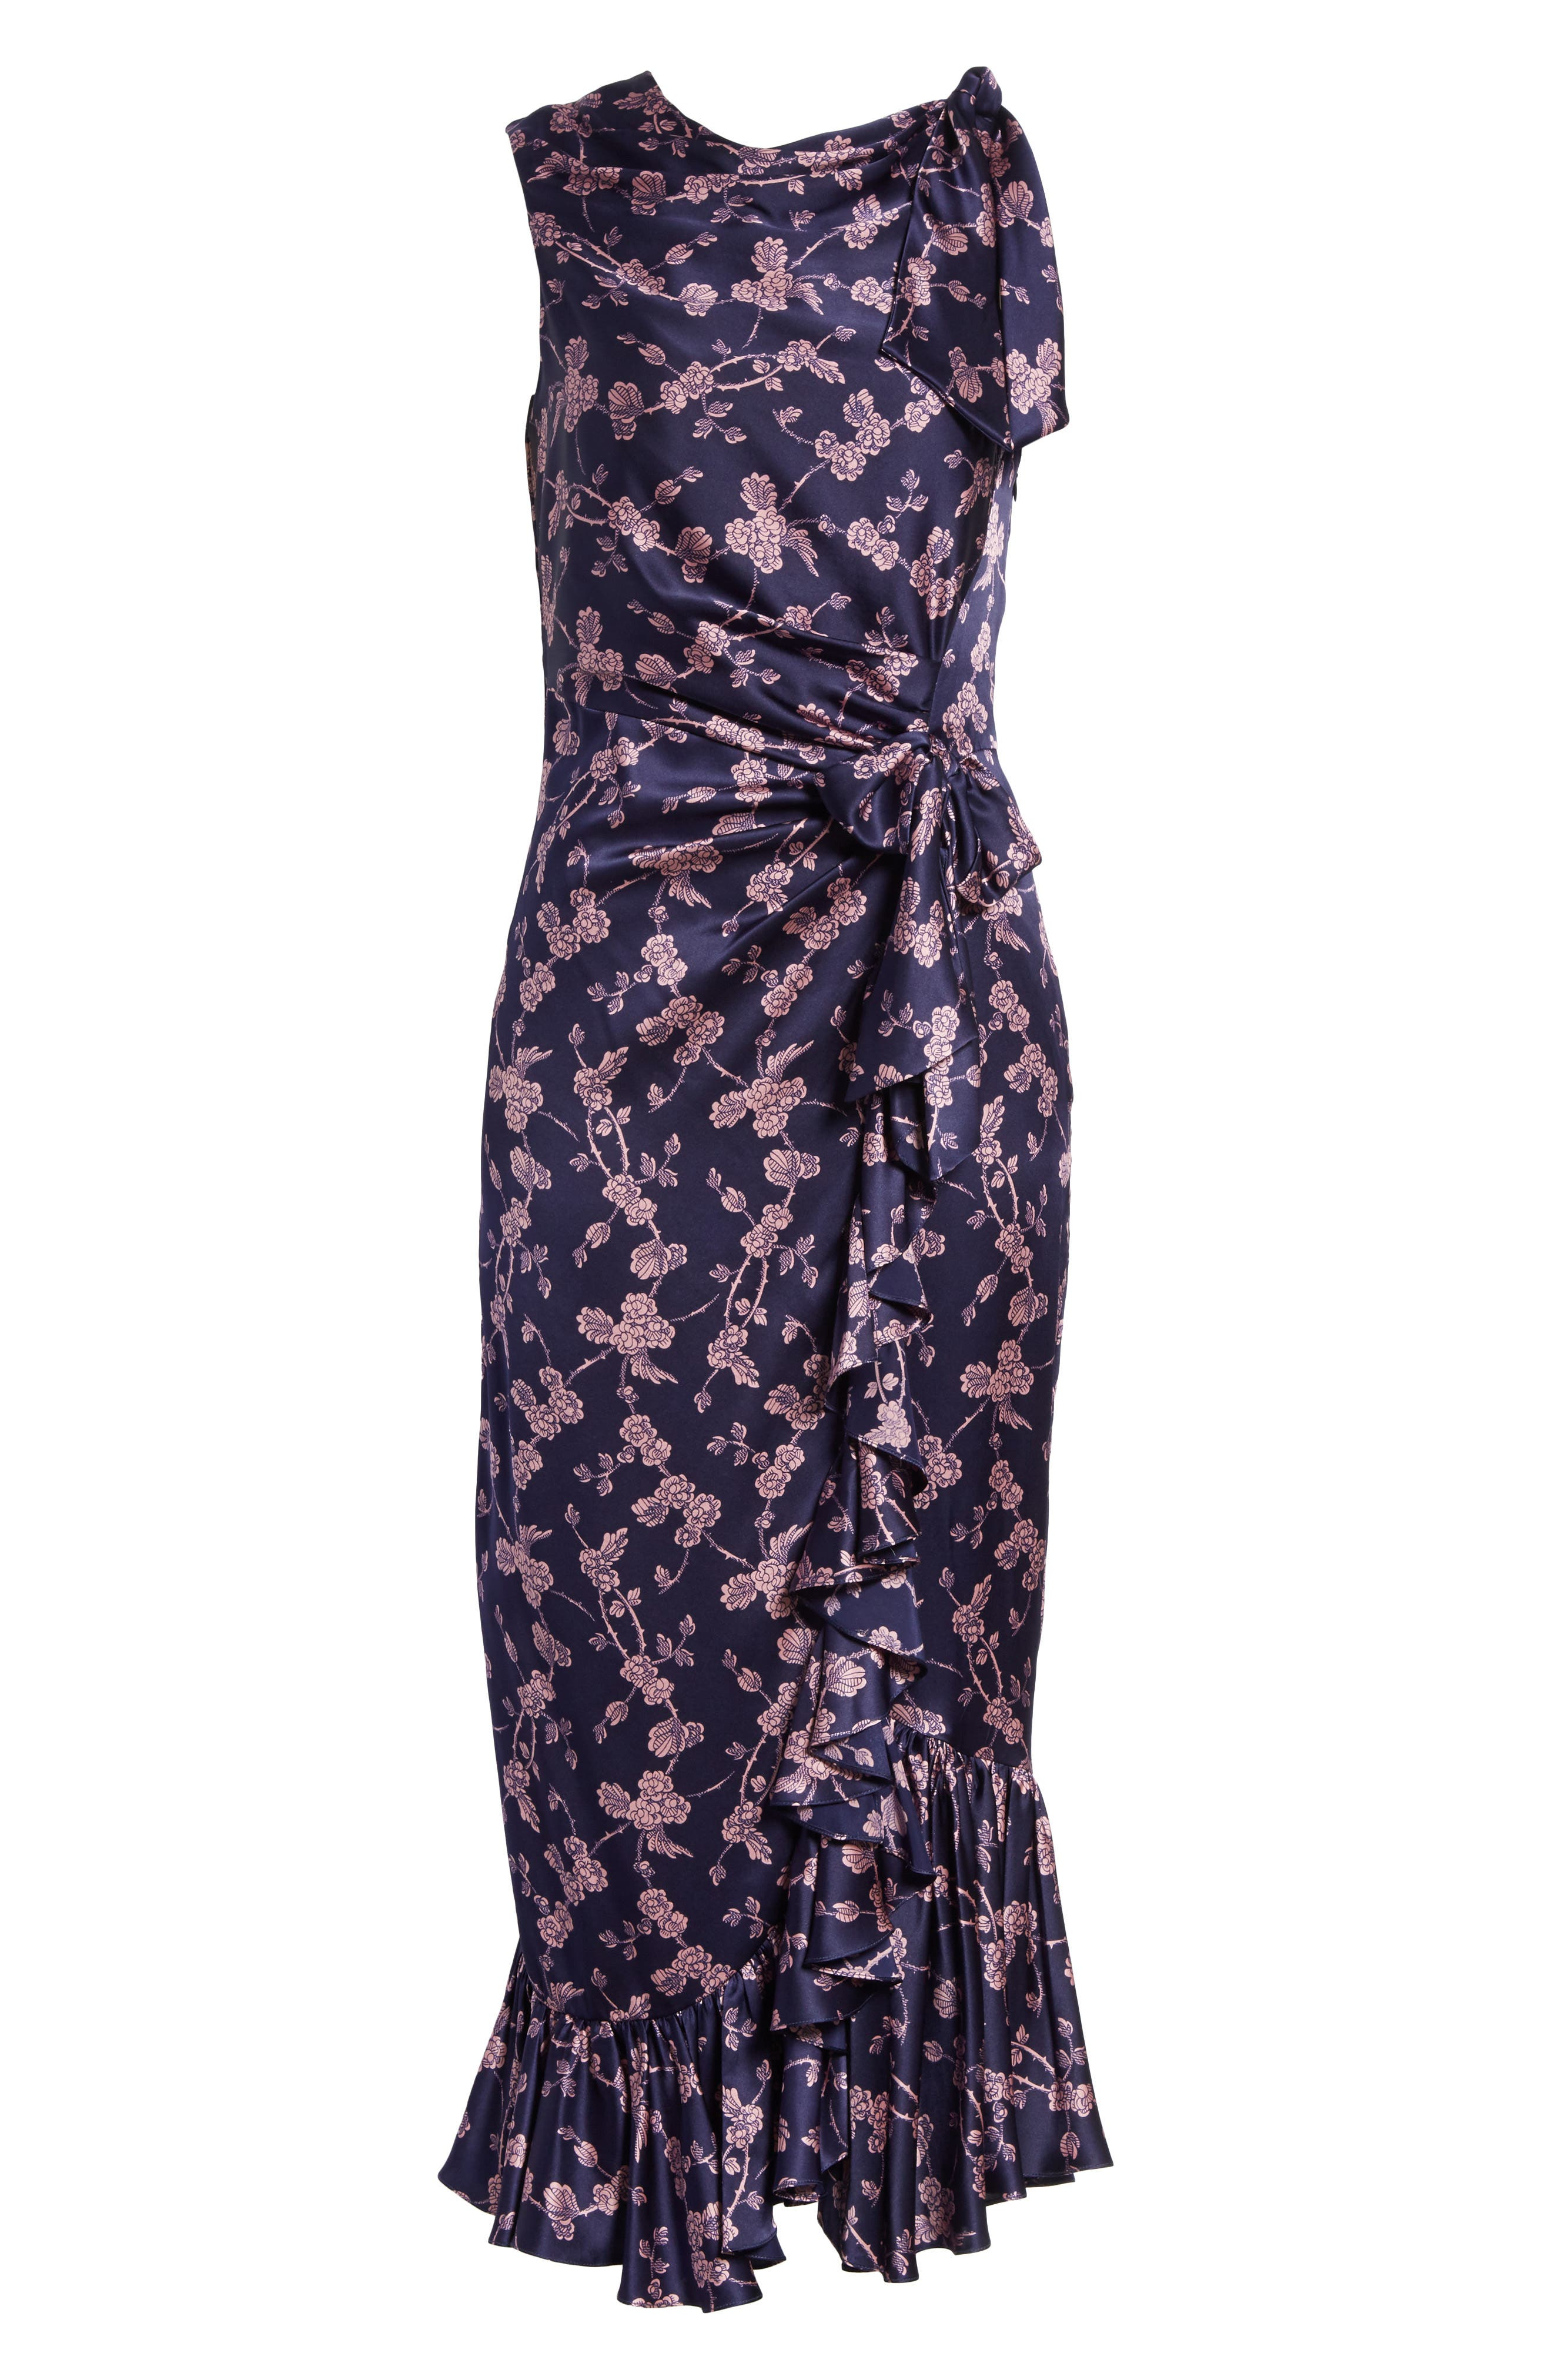 Nanon Knotted Silk Dress,                             Alternate thumbnail 6, color,                             699